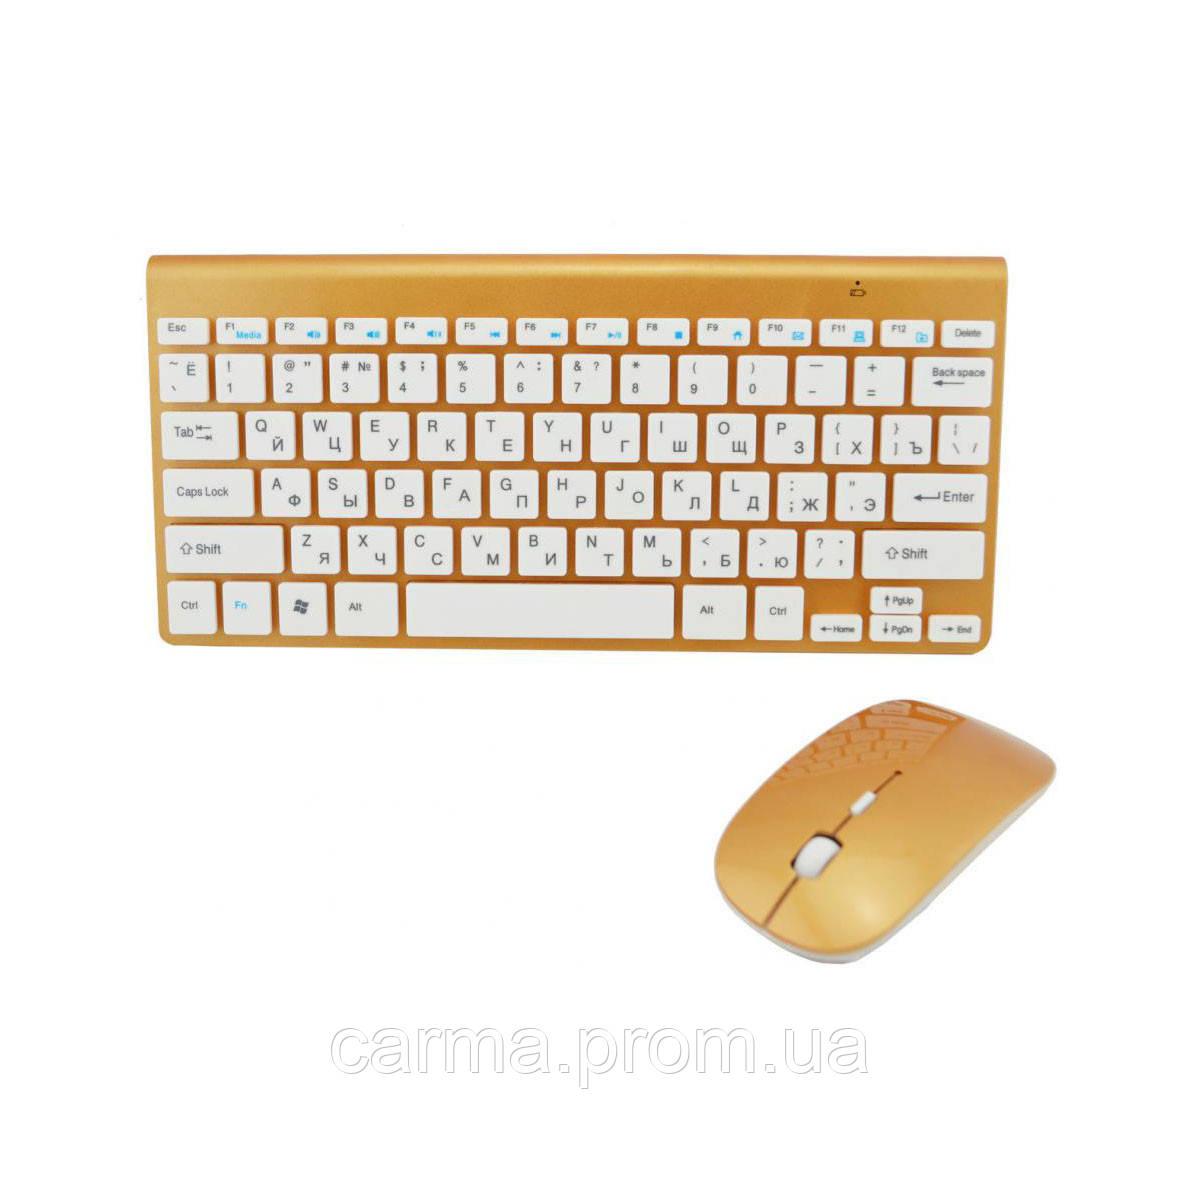 Комплект Клавиатура + мышка K-07 Золотистый/Белый